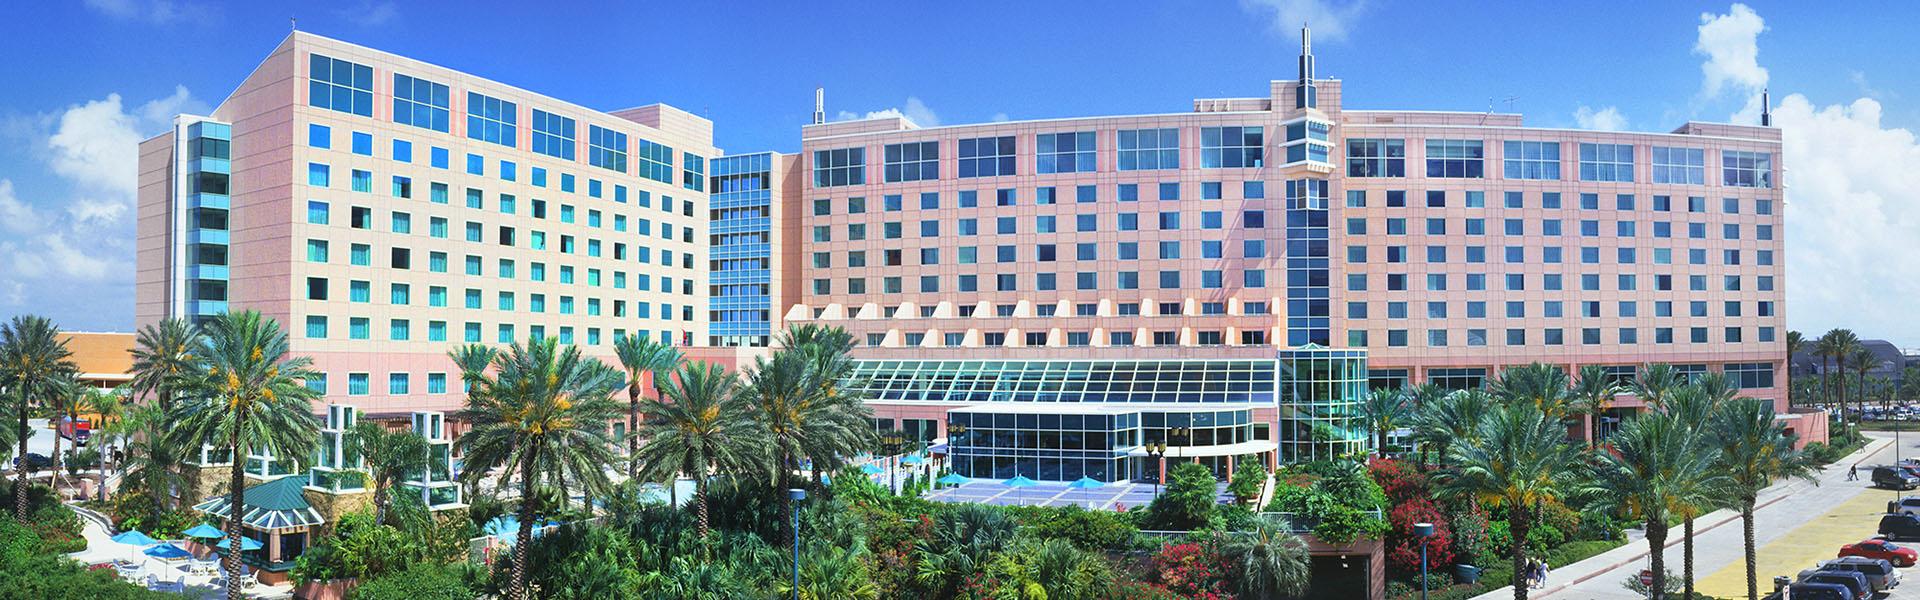 Moody Gardens Hotel, Galveston TX